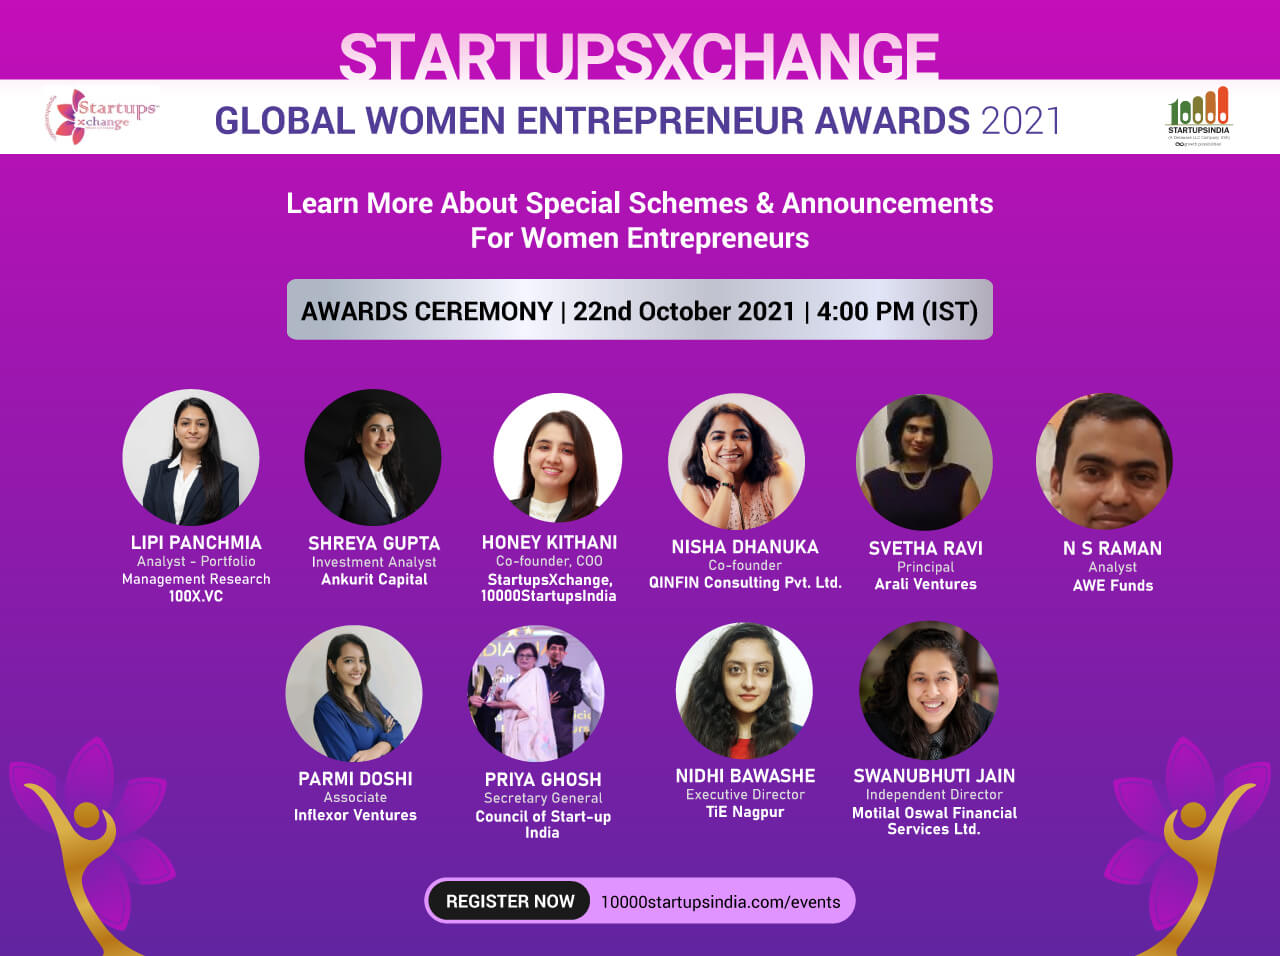 AwardCeremony-StartupsXchange-Teaser-new